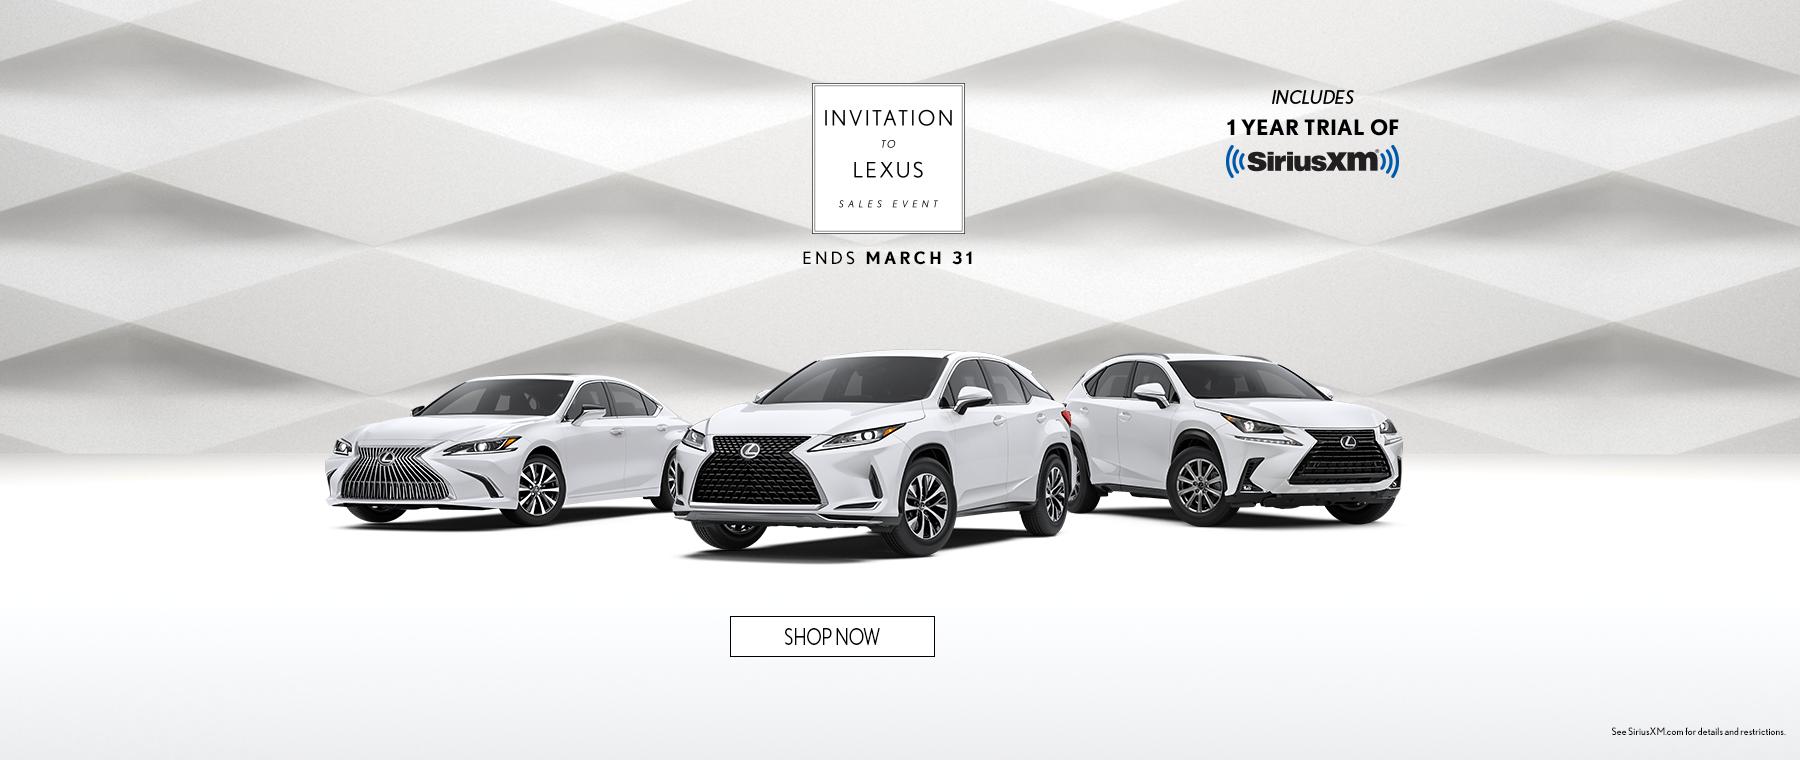 Invitation to Lexus 2021